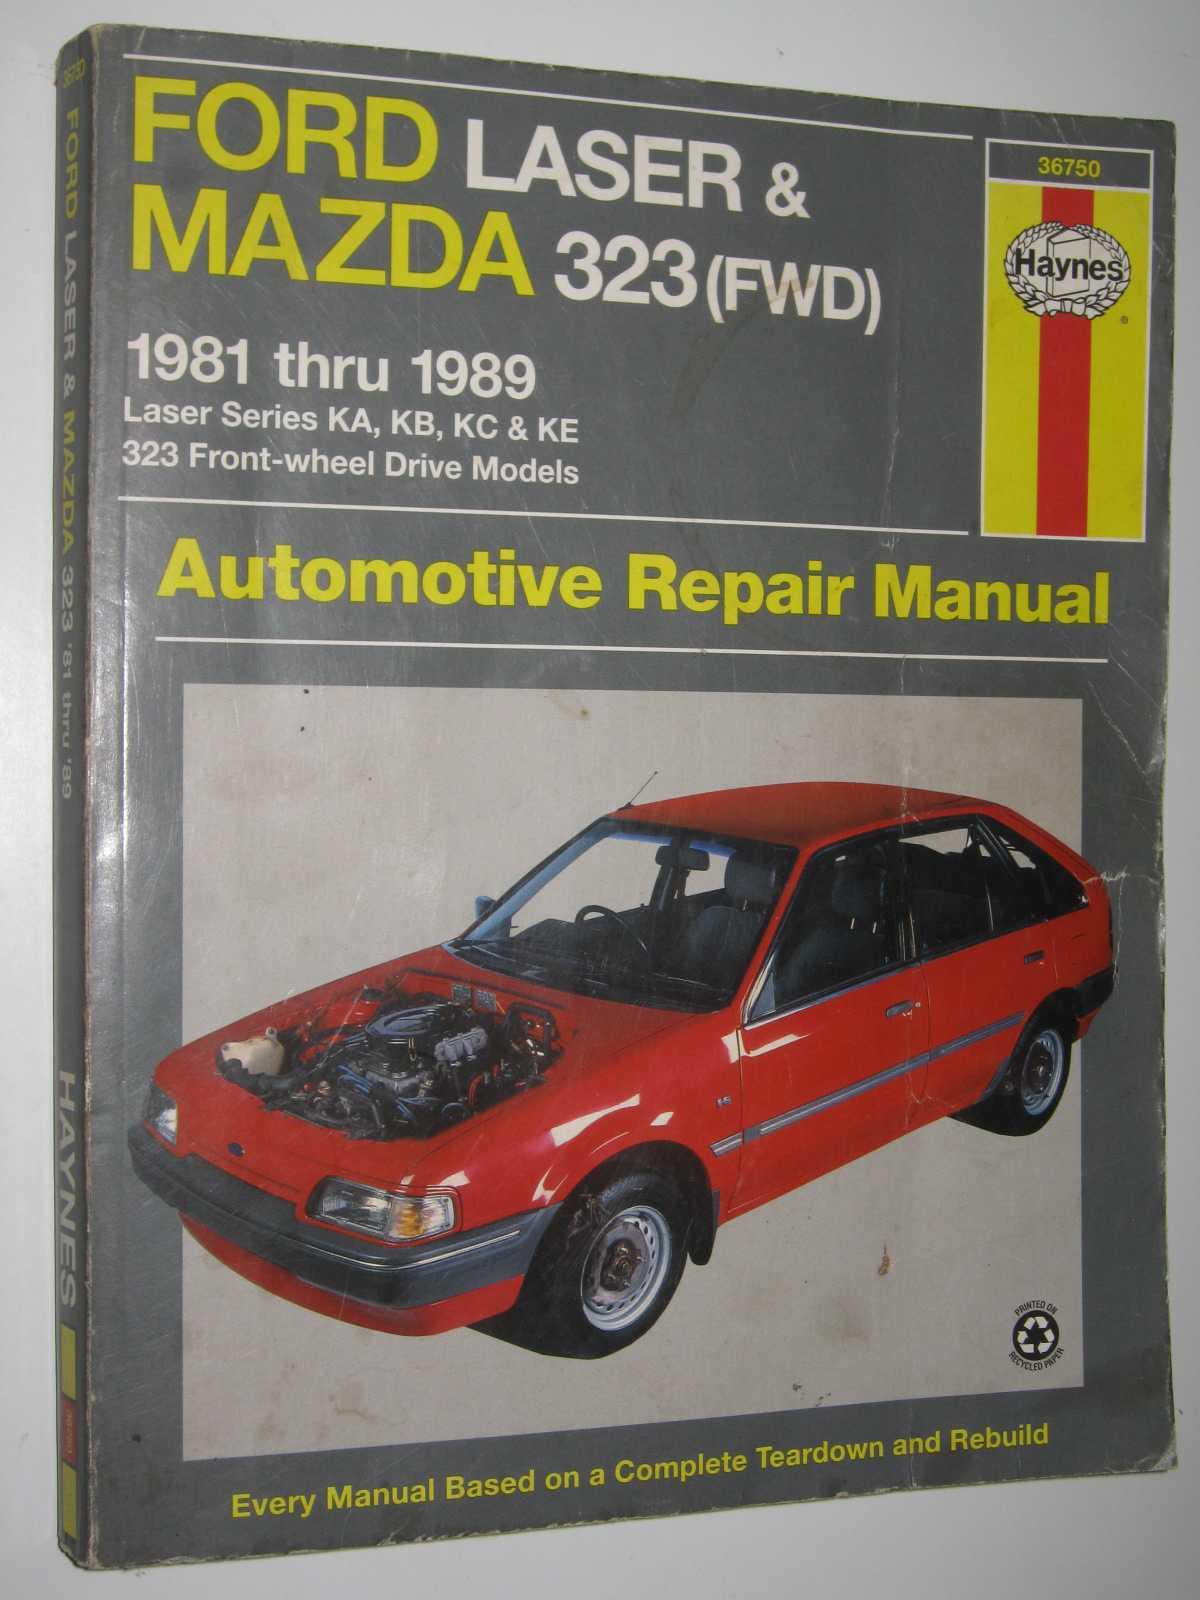 Image for Ford Laser & Mazda 323 automotive repair manual 1981 thru 1989 :  Laser series